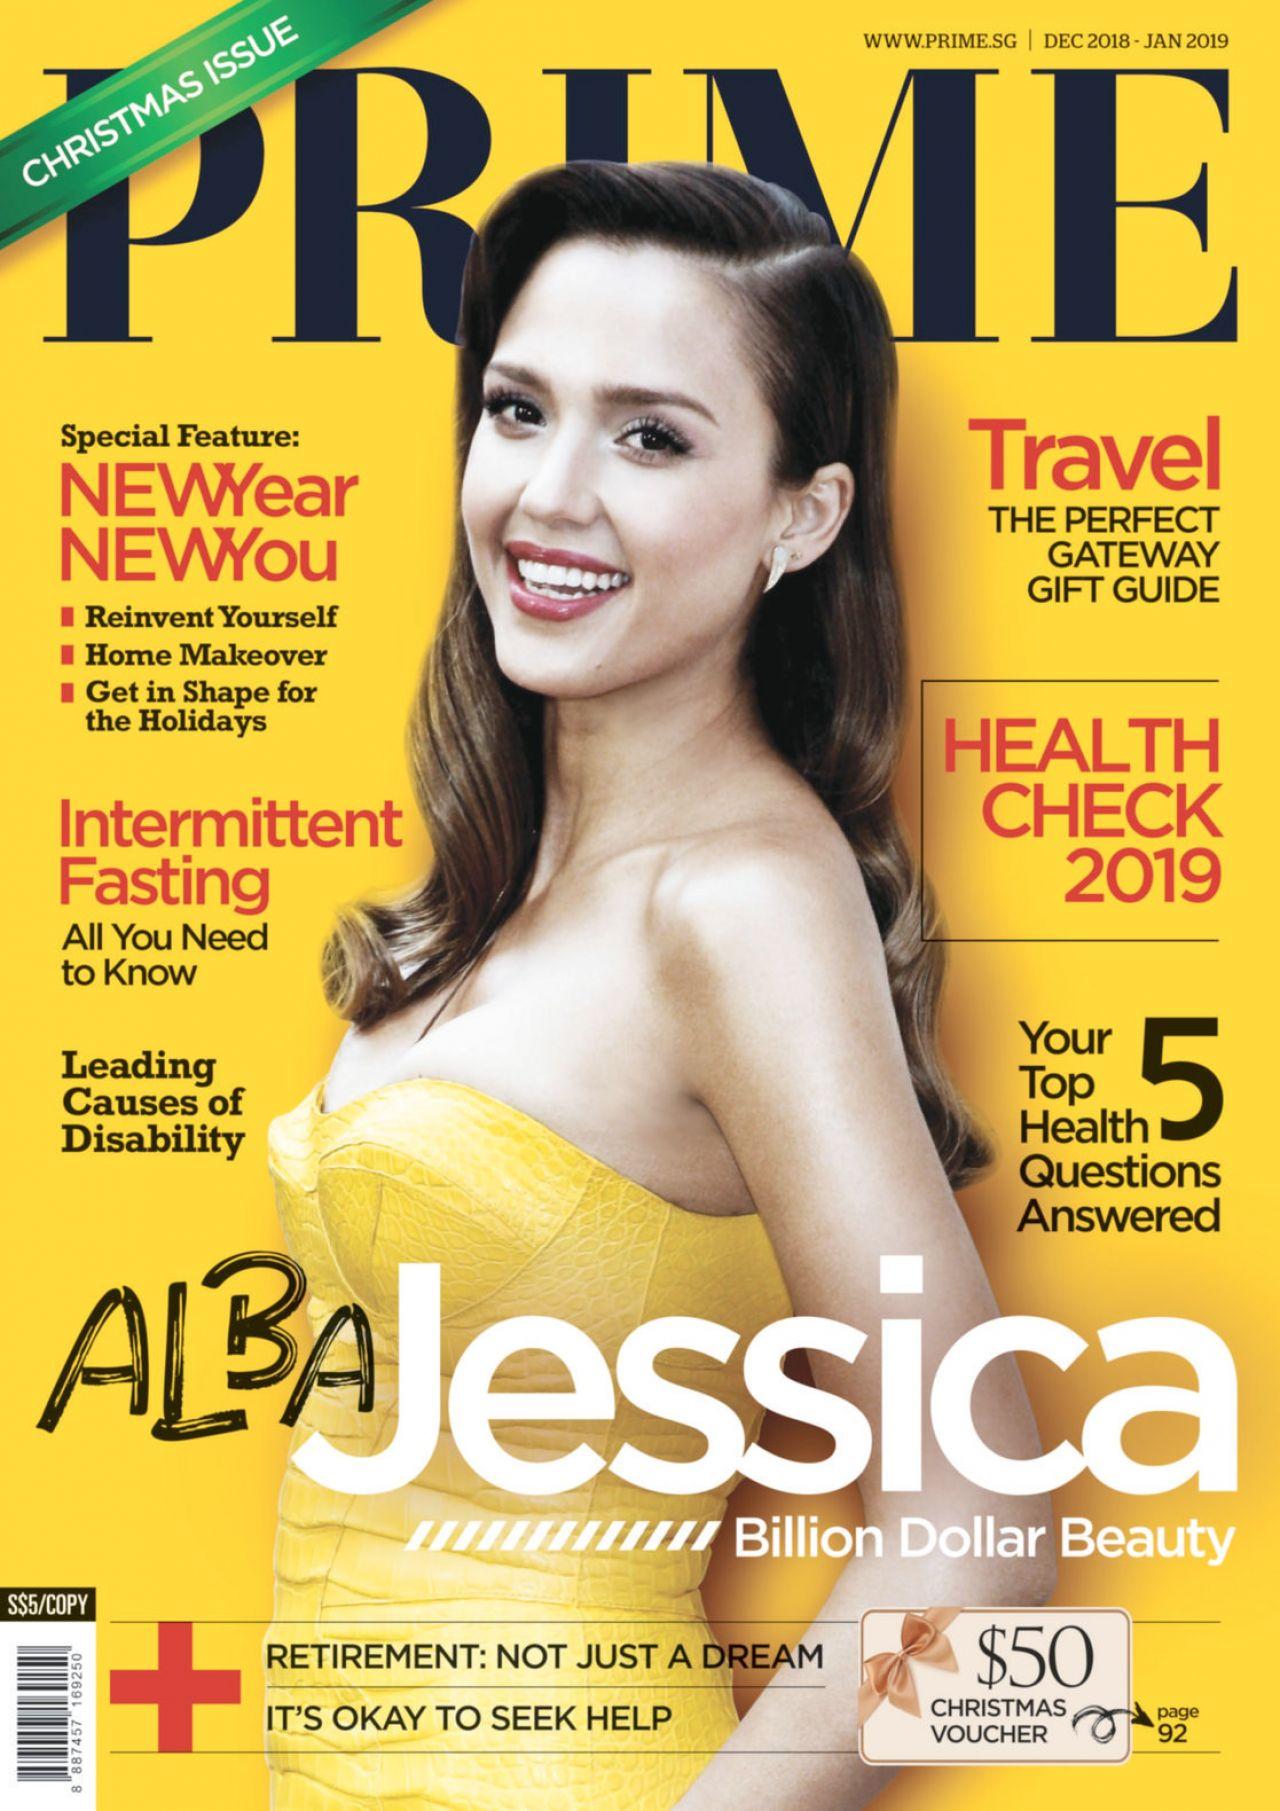 Jessica Alba Latest Photos